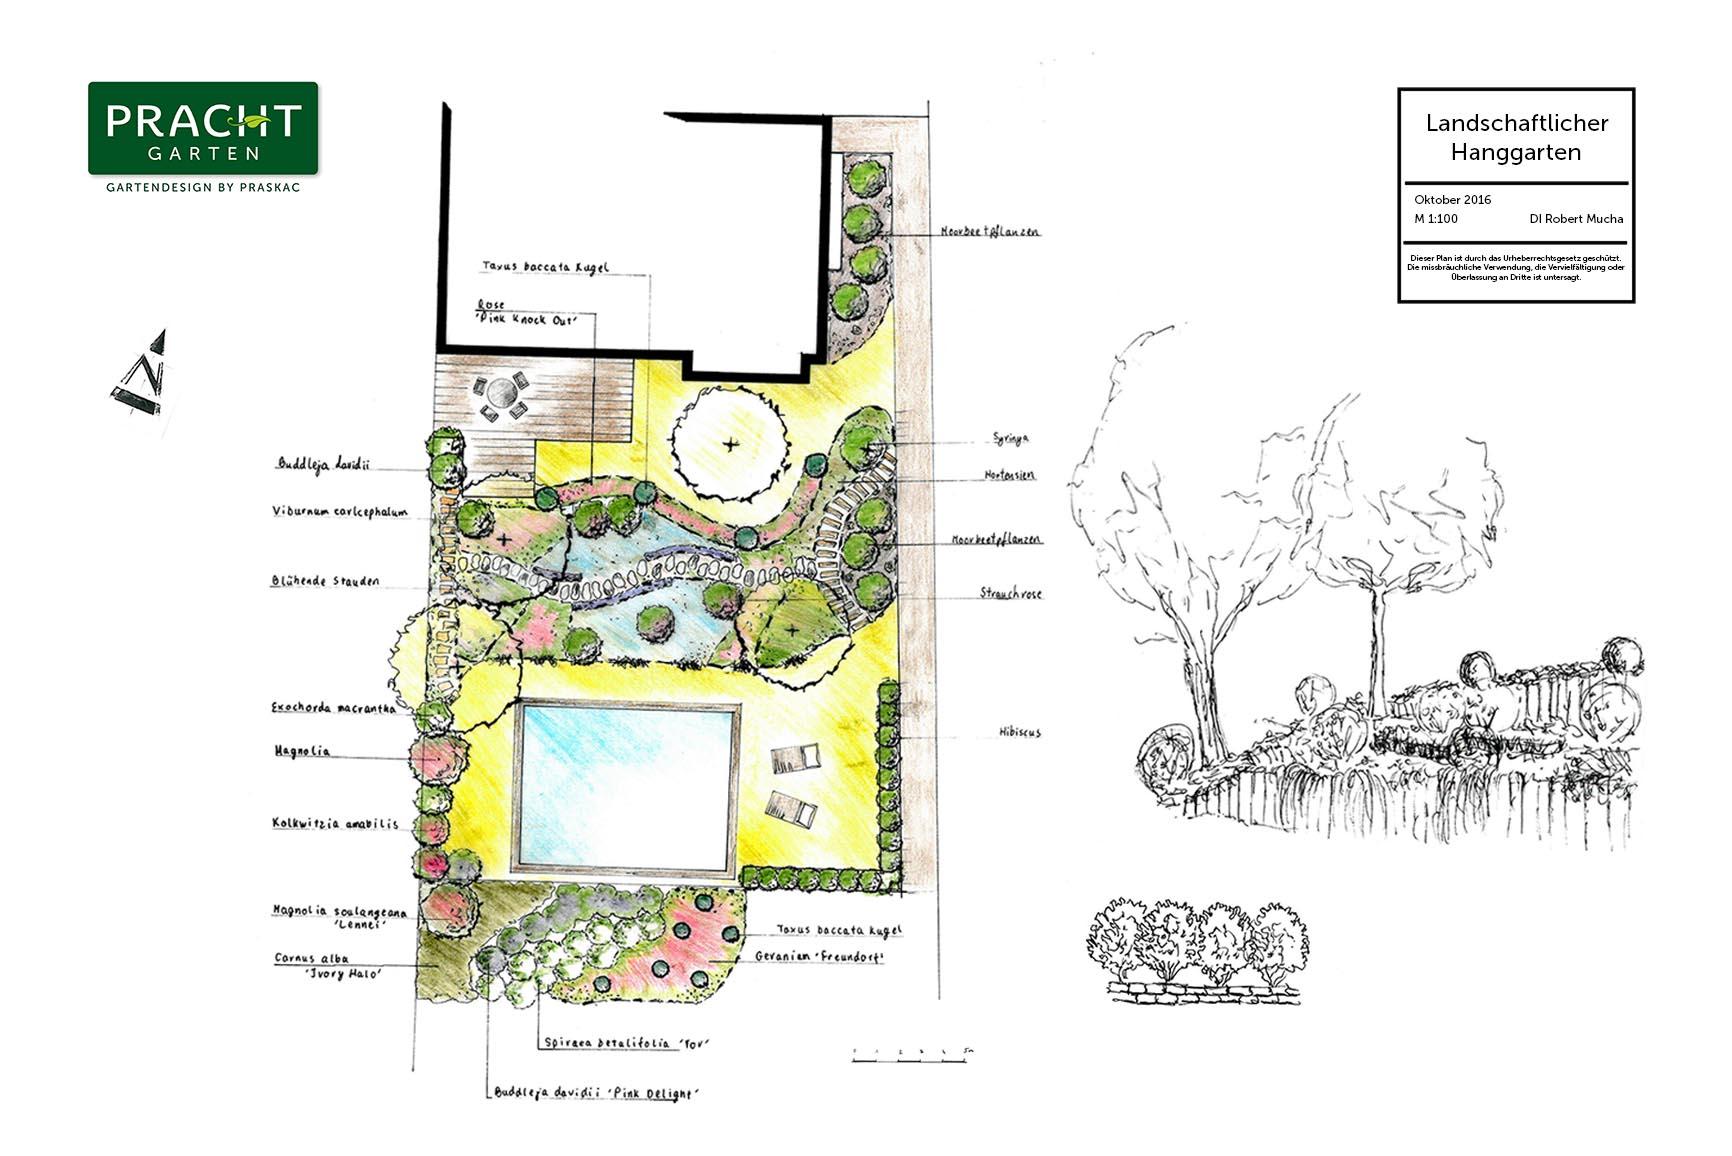 Landschaftlicher Hanggartenplanung in NÖ